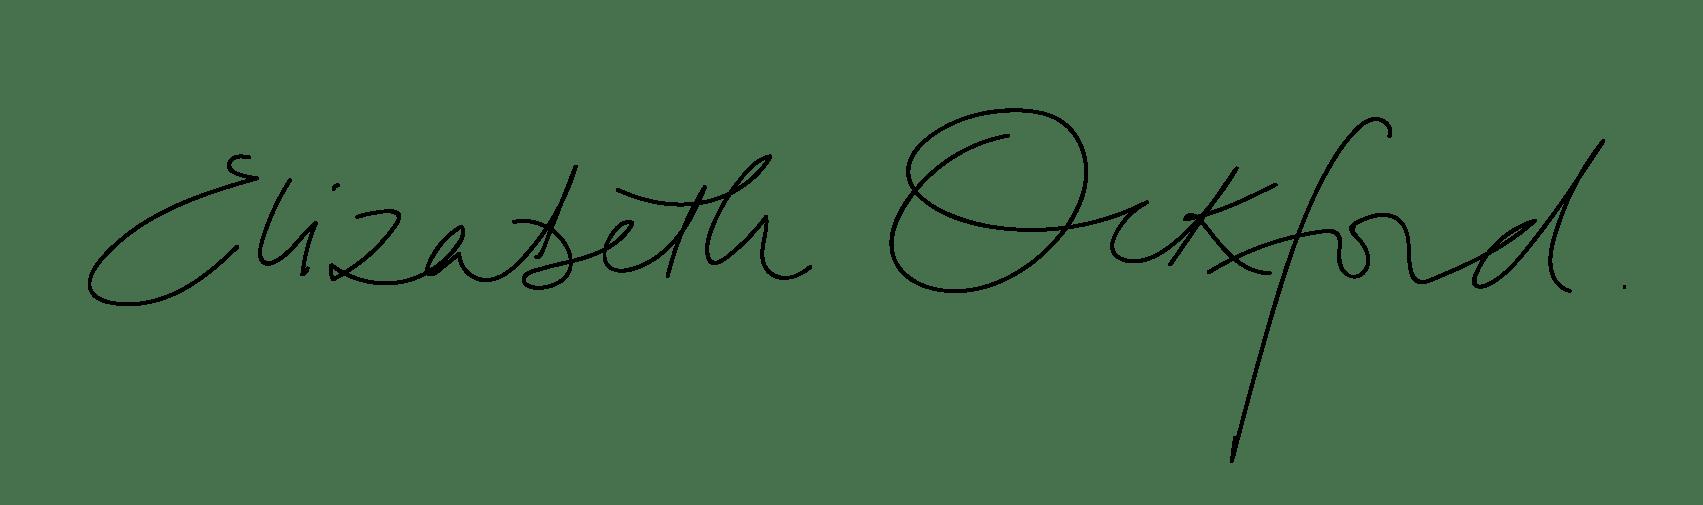 Elizabeth Ockford Signature